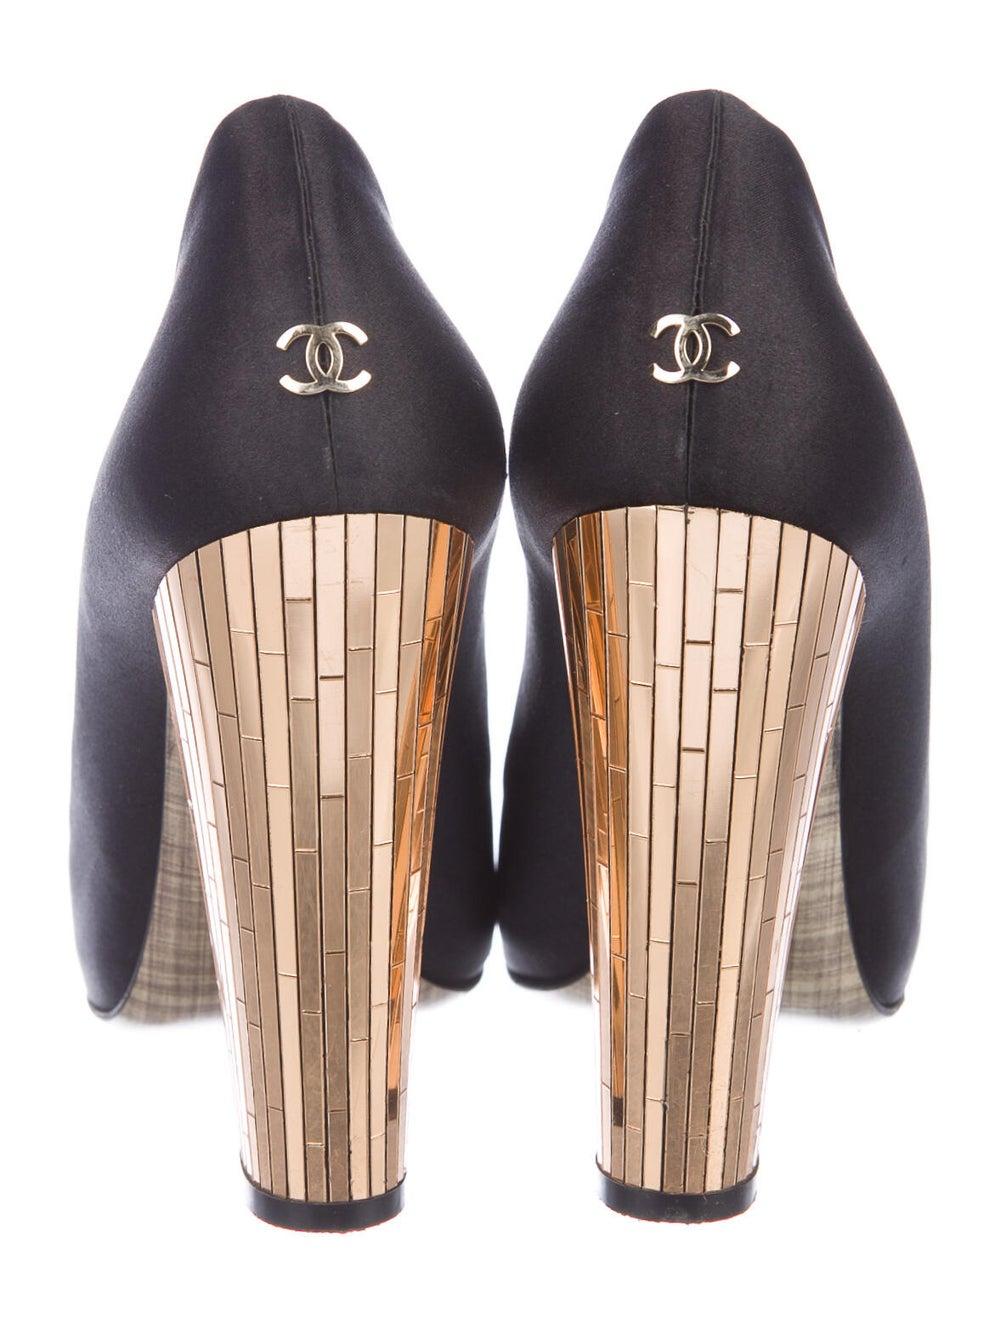 Chanel CC Mirrored Pumps Pumps Black - image 4